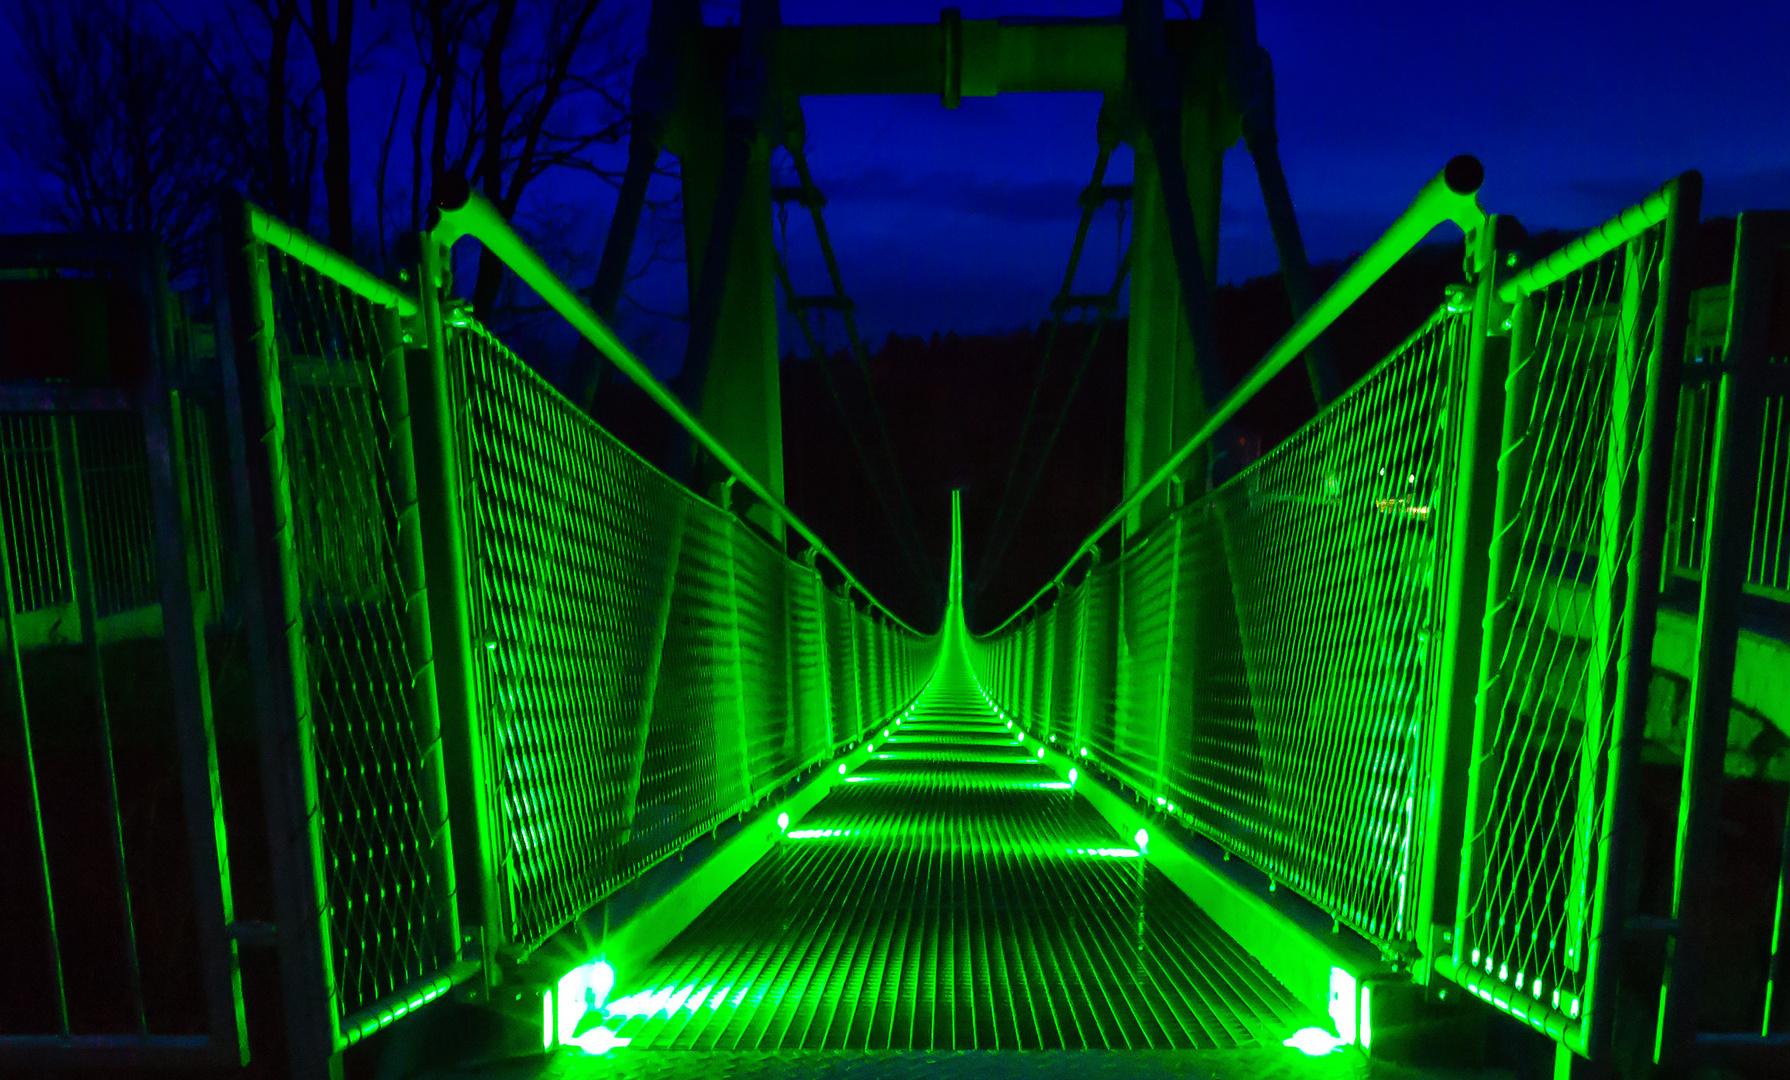 Fußgängerhängebrücke im Harz